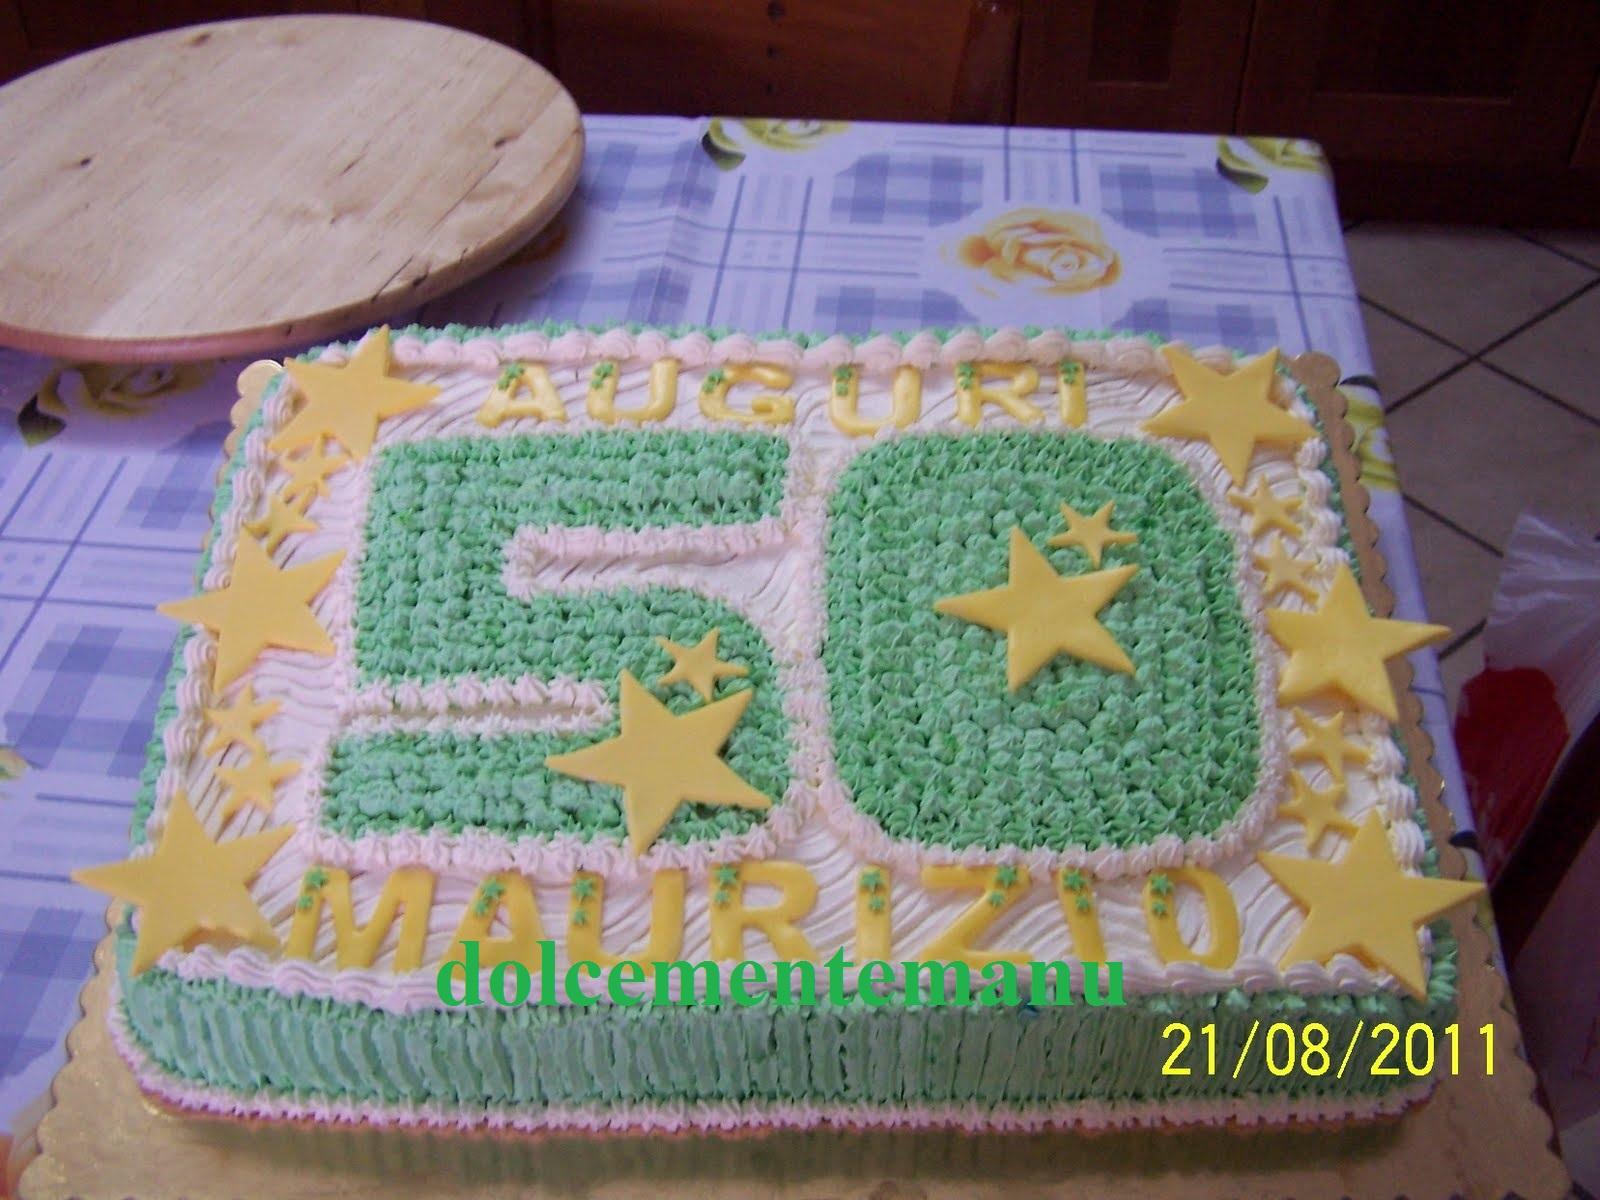 Dolcementemanu Torta X 50 Anni